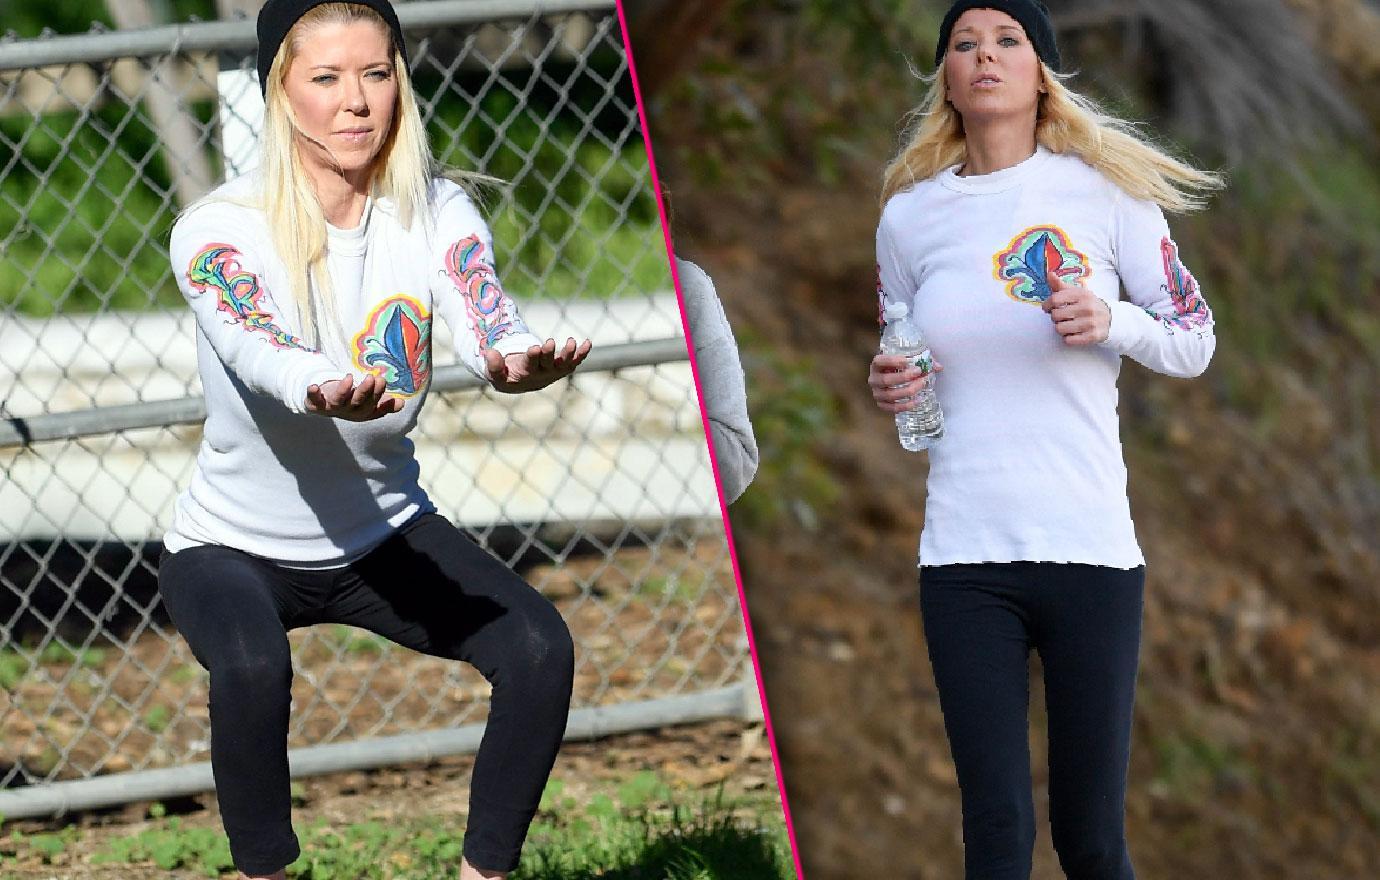 Scary Skinny Tara Reid Jogs With New Fitness Trainer